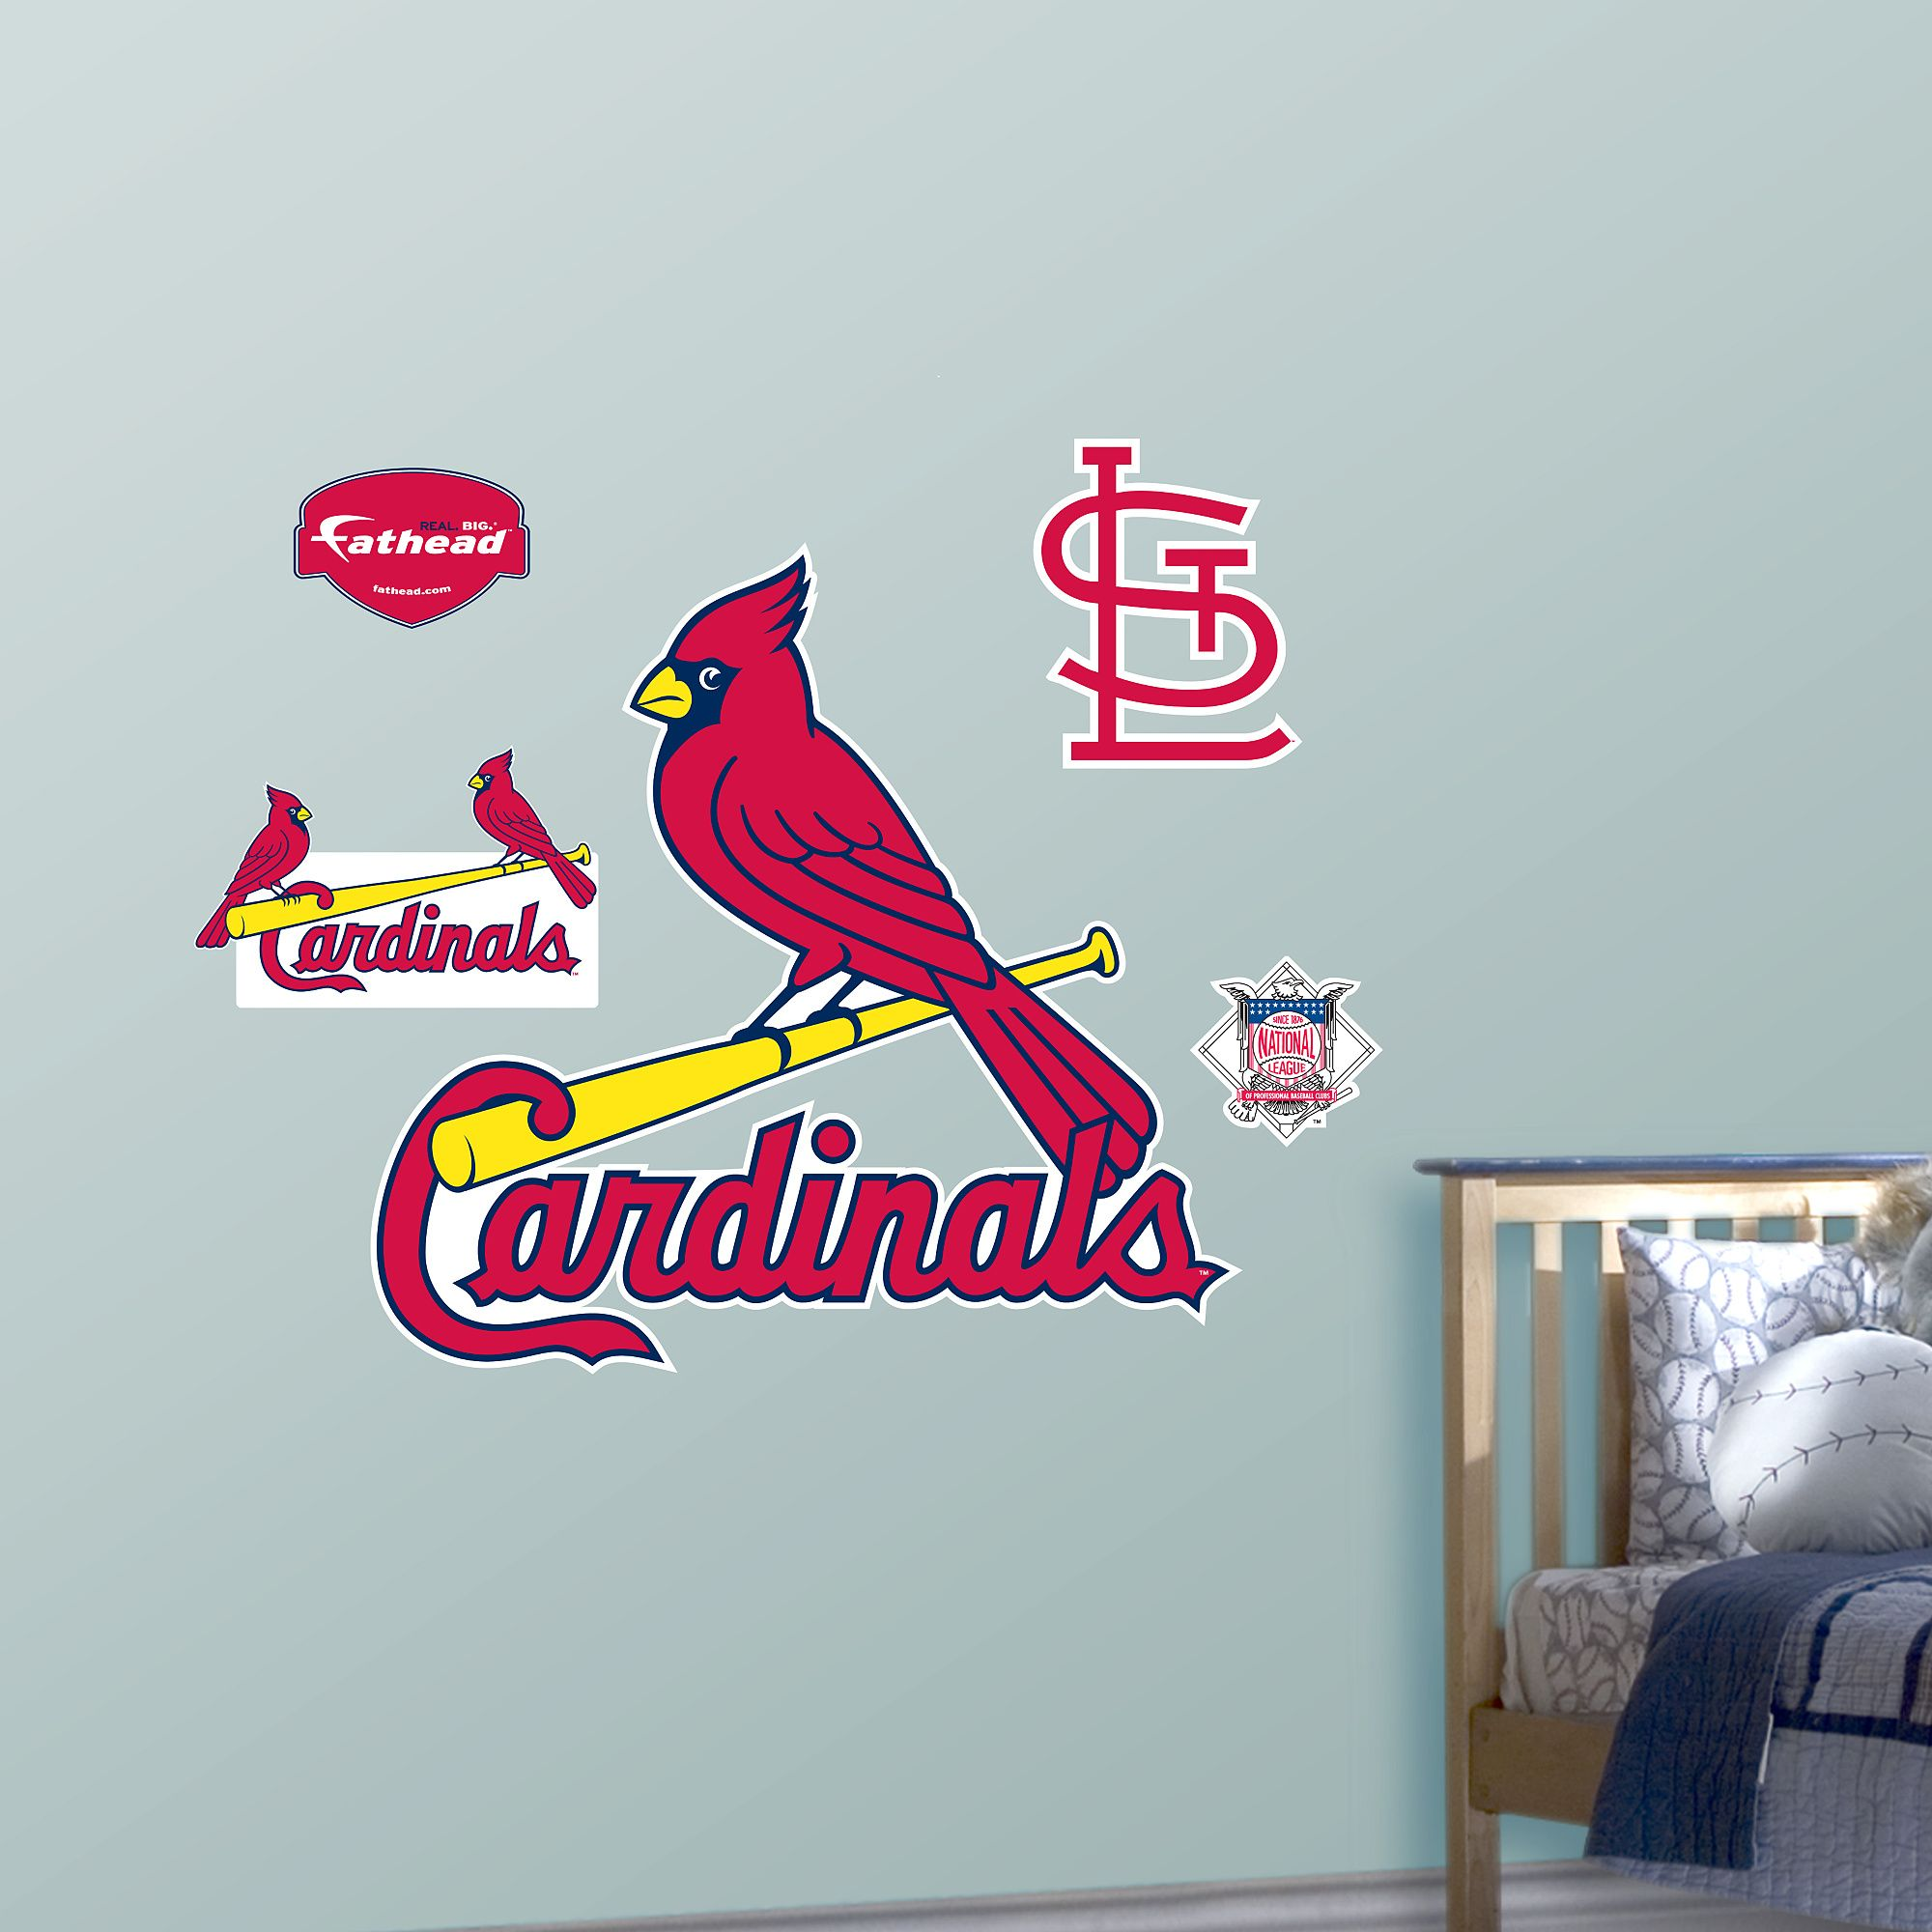 St Louis Cardinals Logo Baseball Wall Decal Cardinals St Louis Cardinals